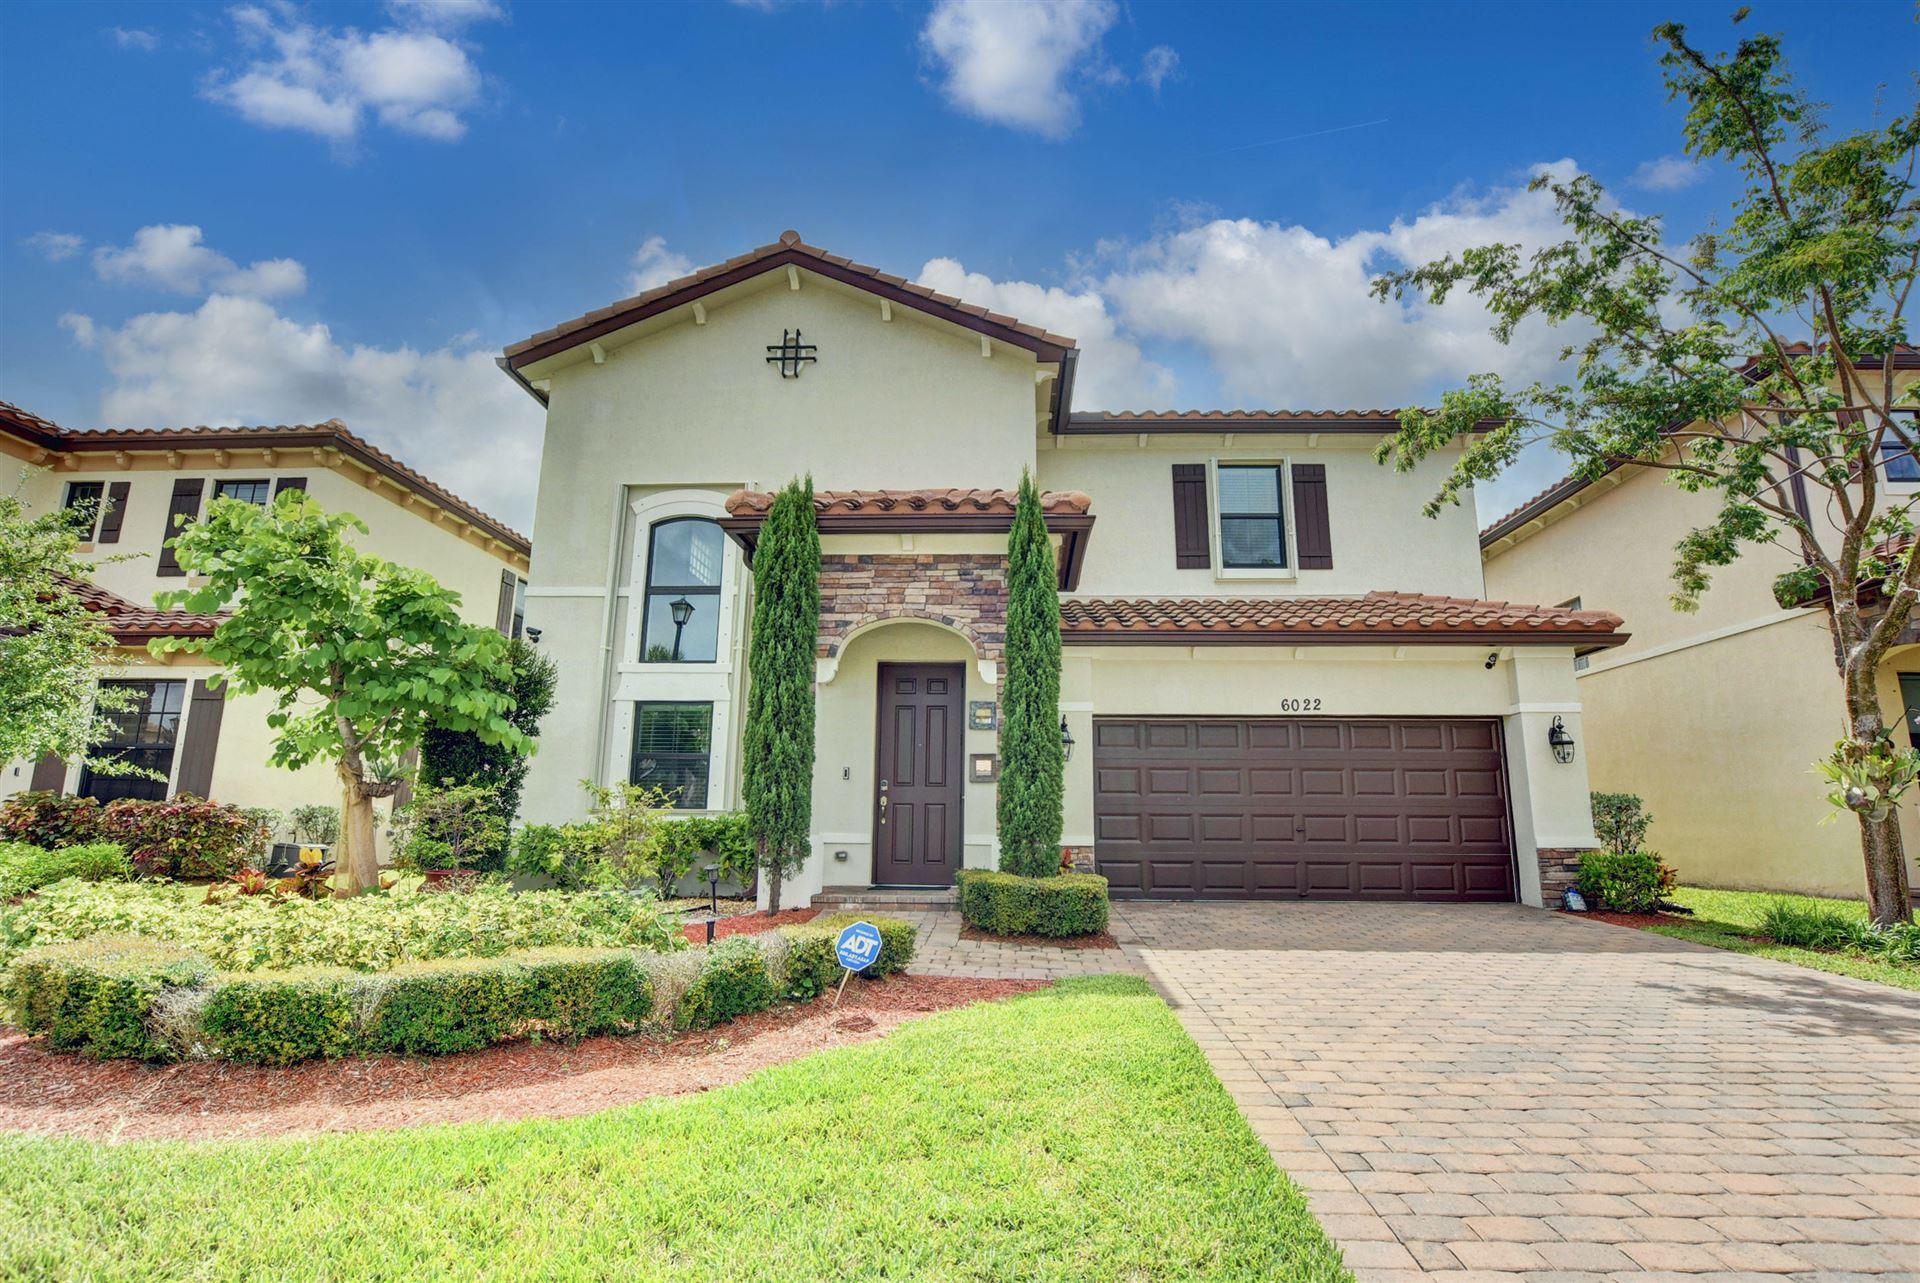 6022 Sandhill Crane Drive, Greenacres, FL 33415 - MLS#: RX-10730823